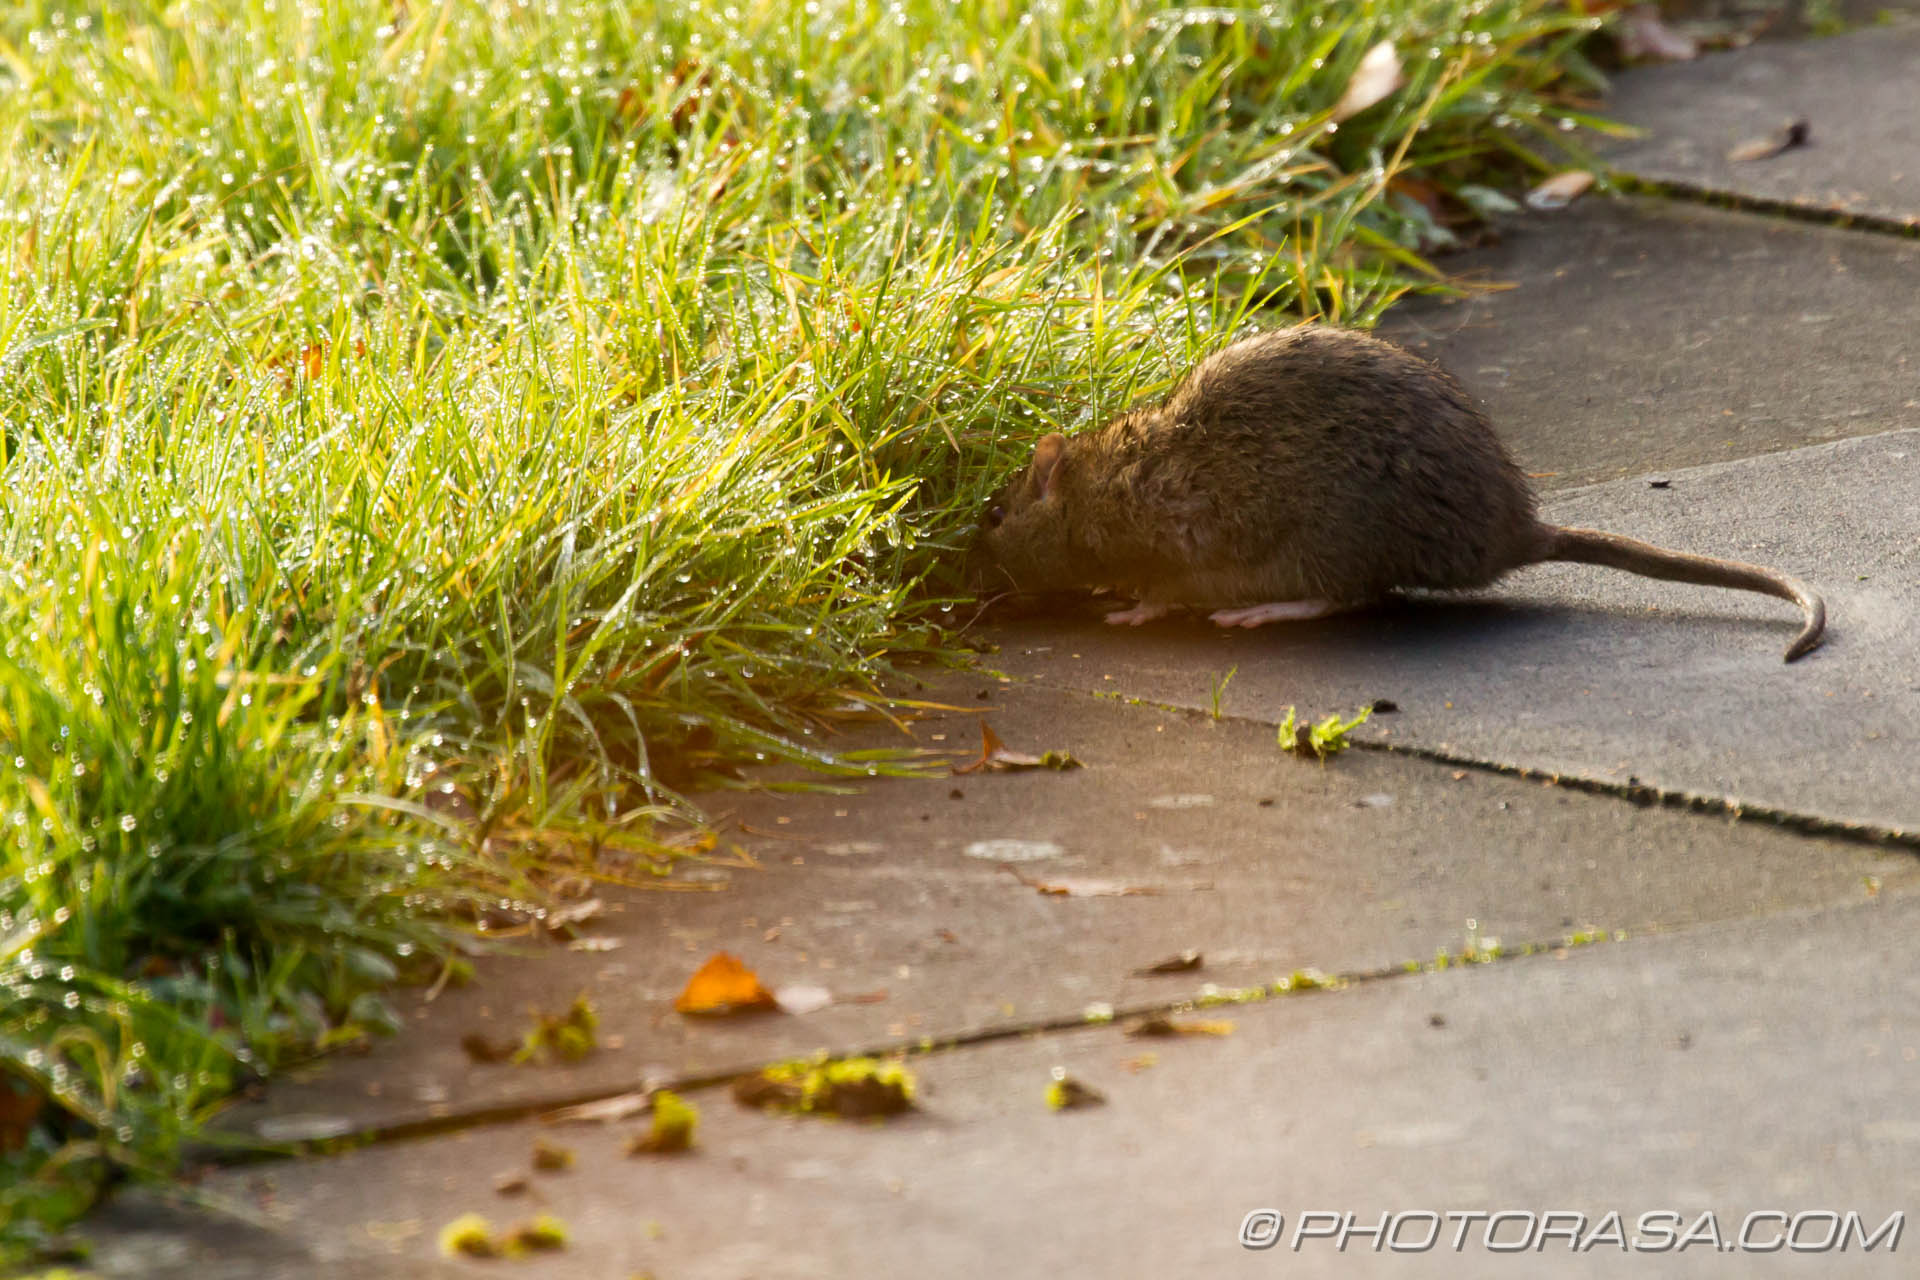 http://photorasa.com/river-rat-maidstone-market/sniffing-around-grass-verge/